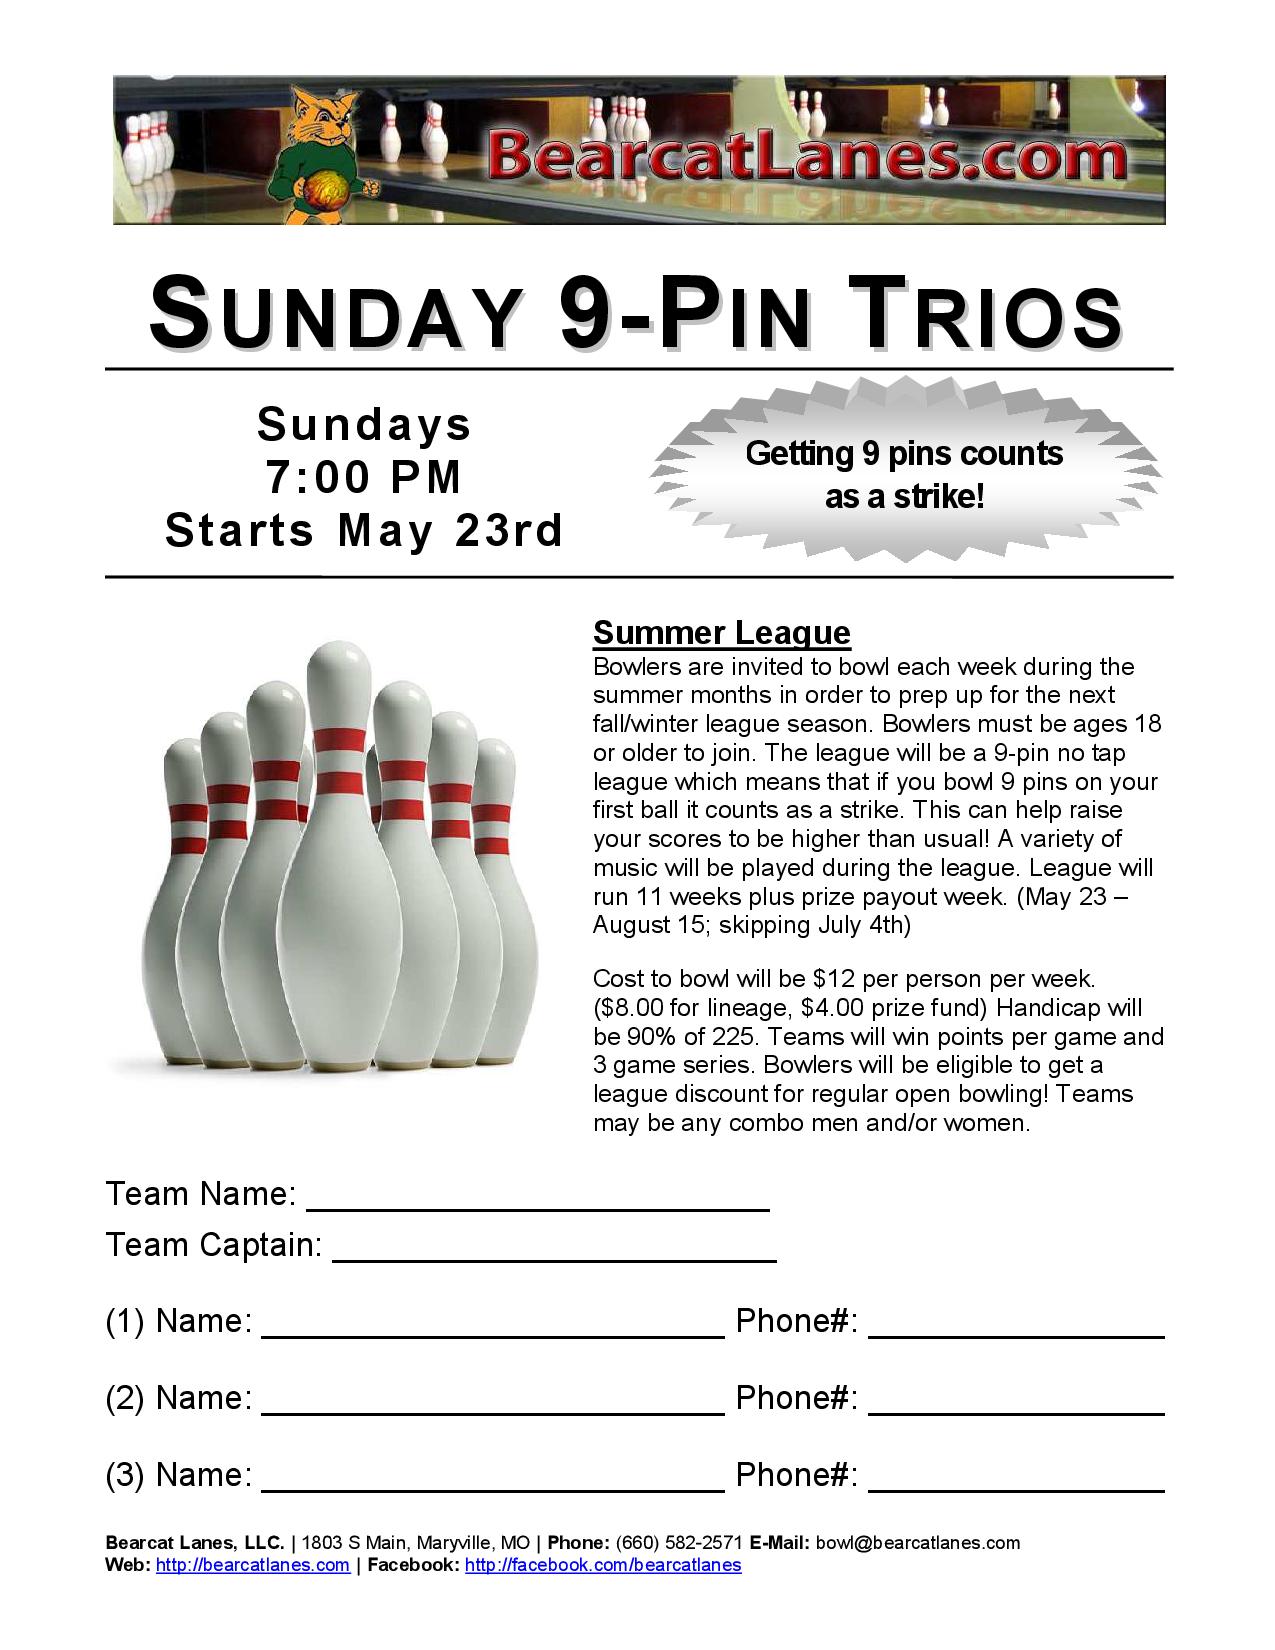 Sunday 9-Pin League